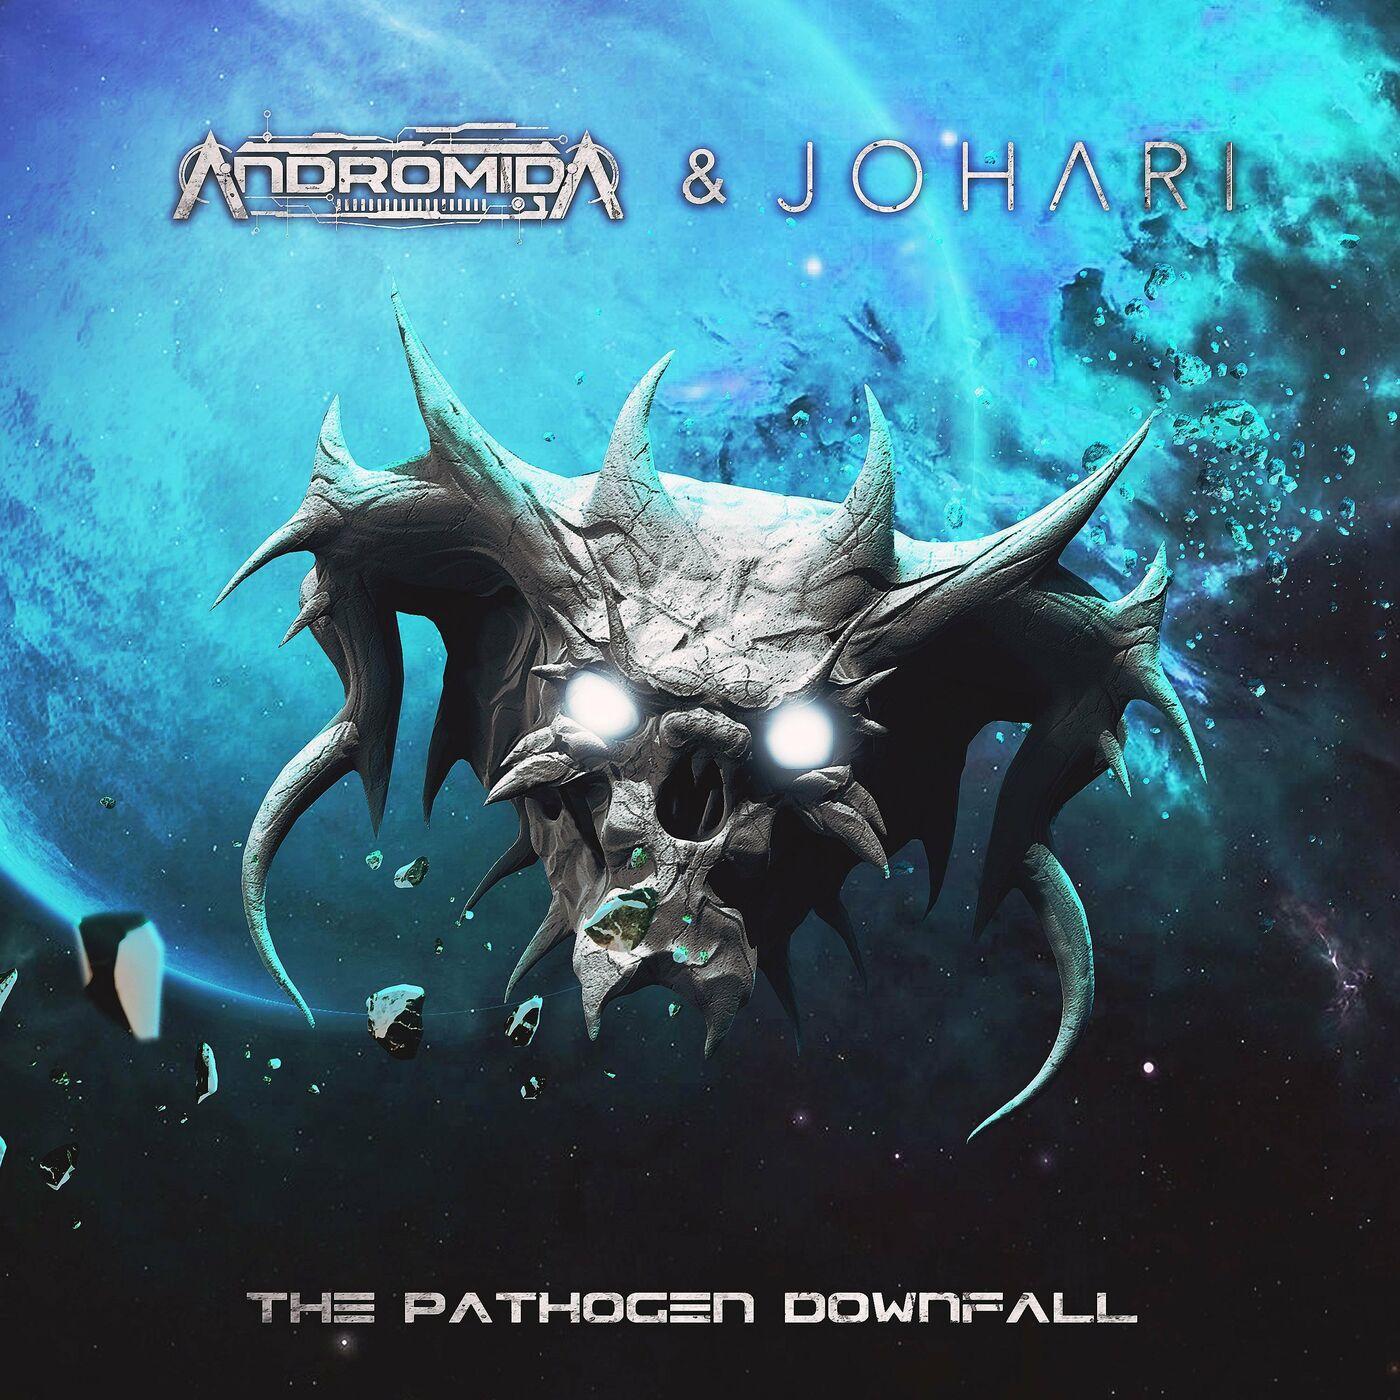 Andromida & Johari - The Pathogen Downfall [single] (2020)